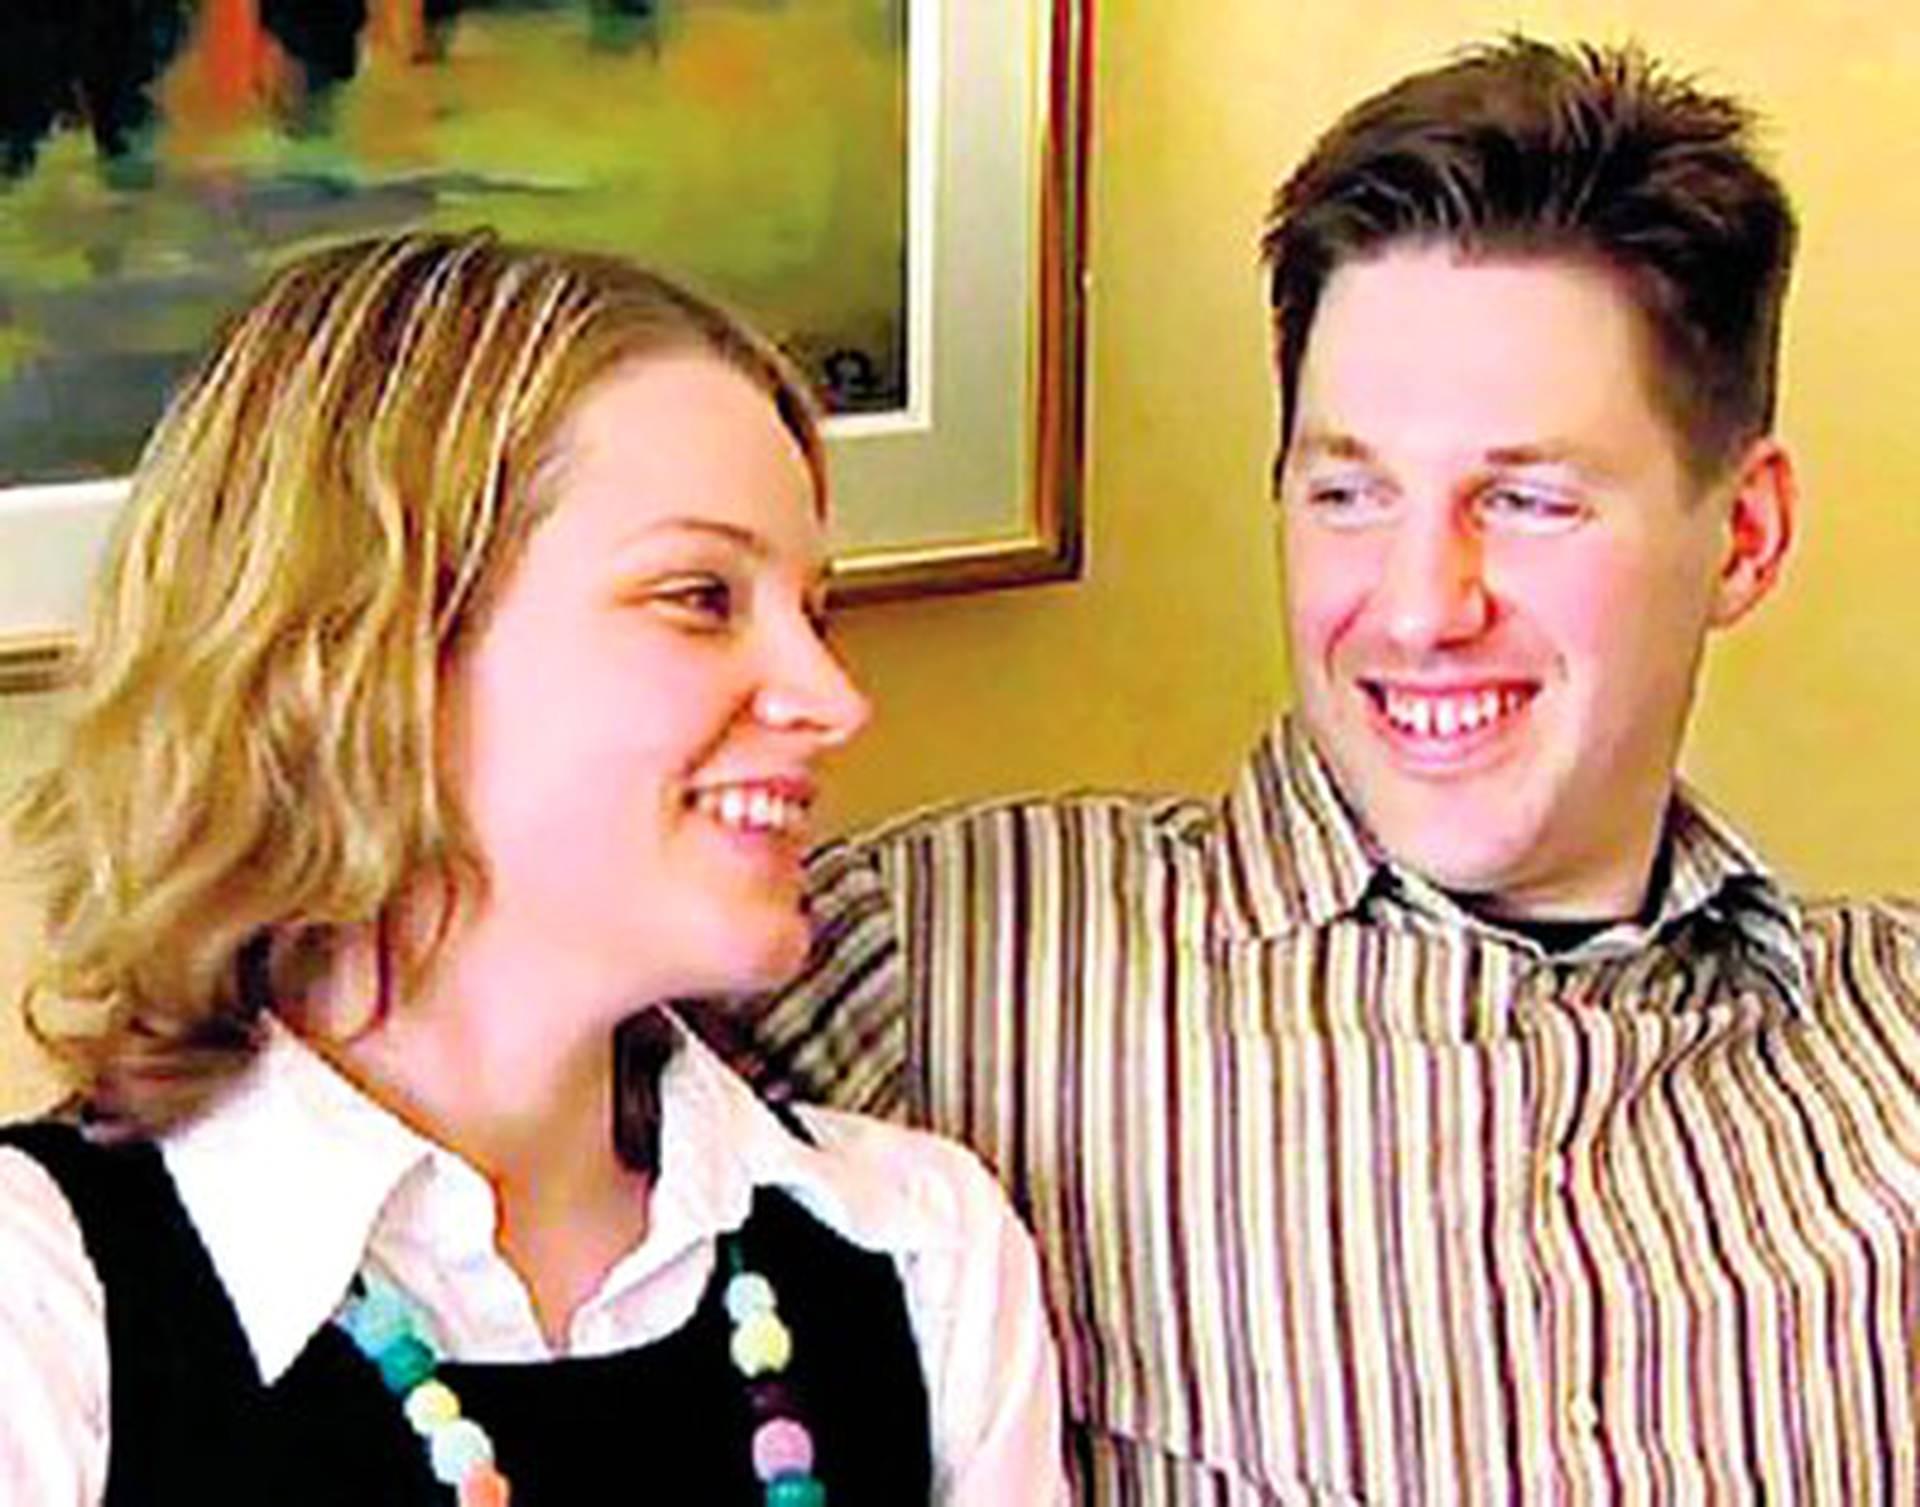 Penny ja Leonard alkavat dating